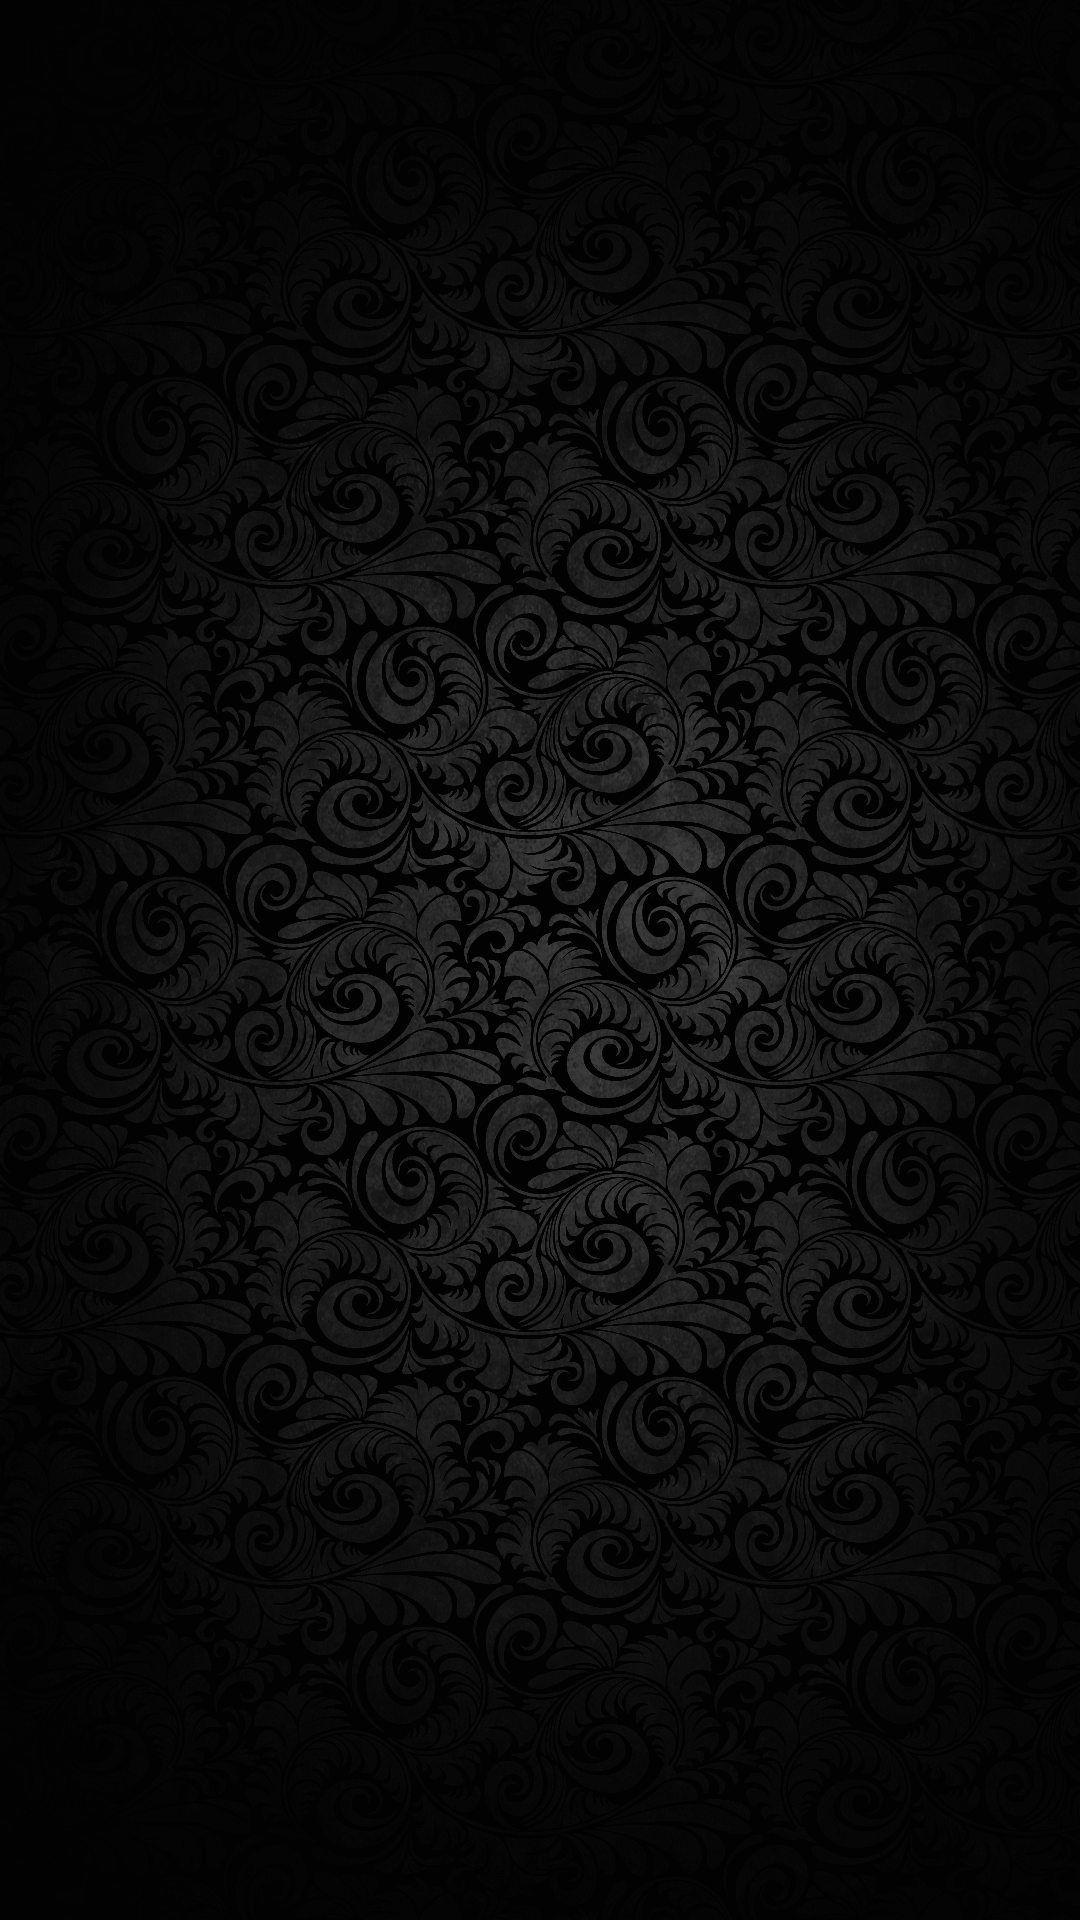 Smartphone Black Wallpapers Wallpaper Cave